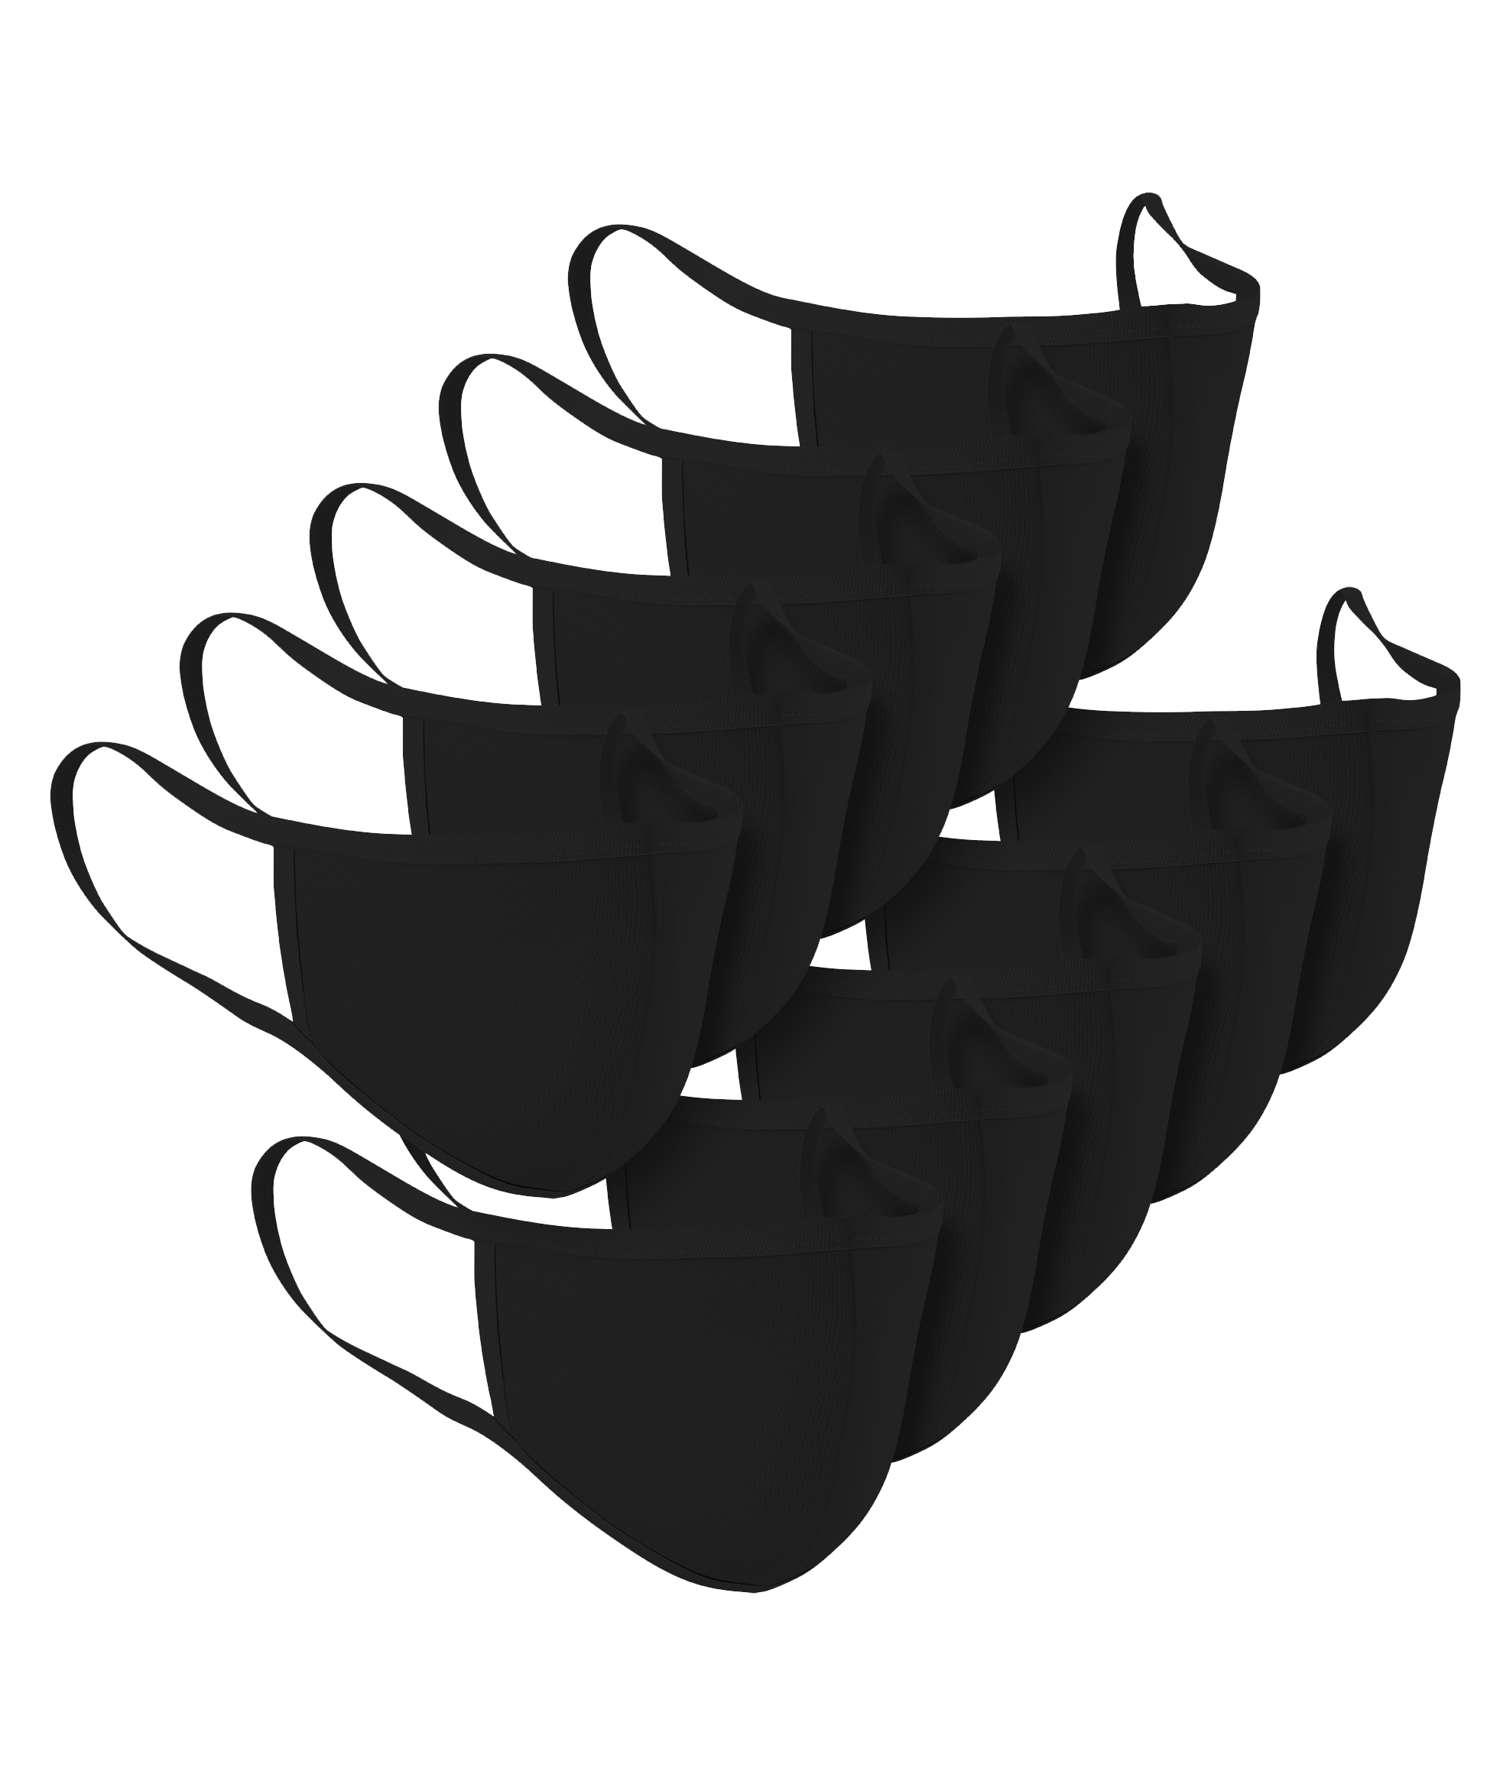 Denim project - 10-pak stof mundbind - Sort - Størrelse One size